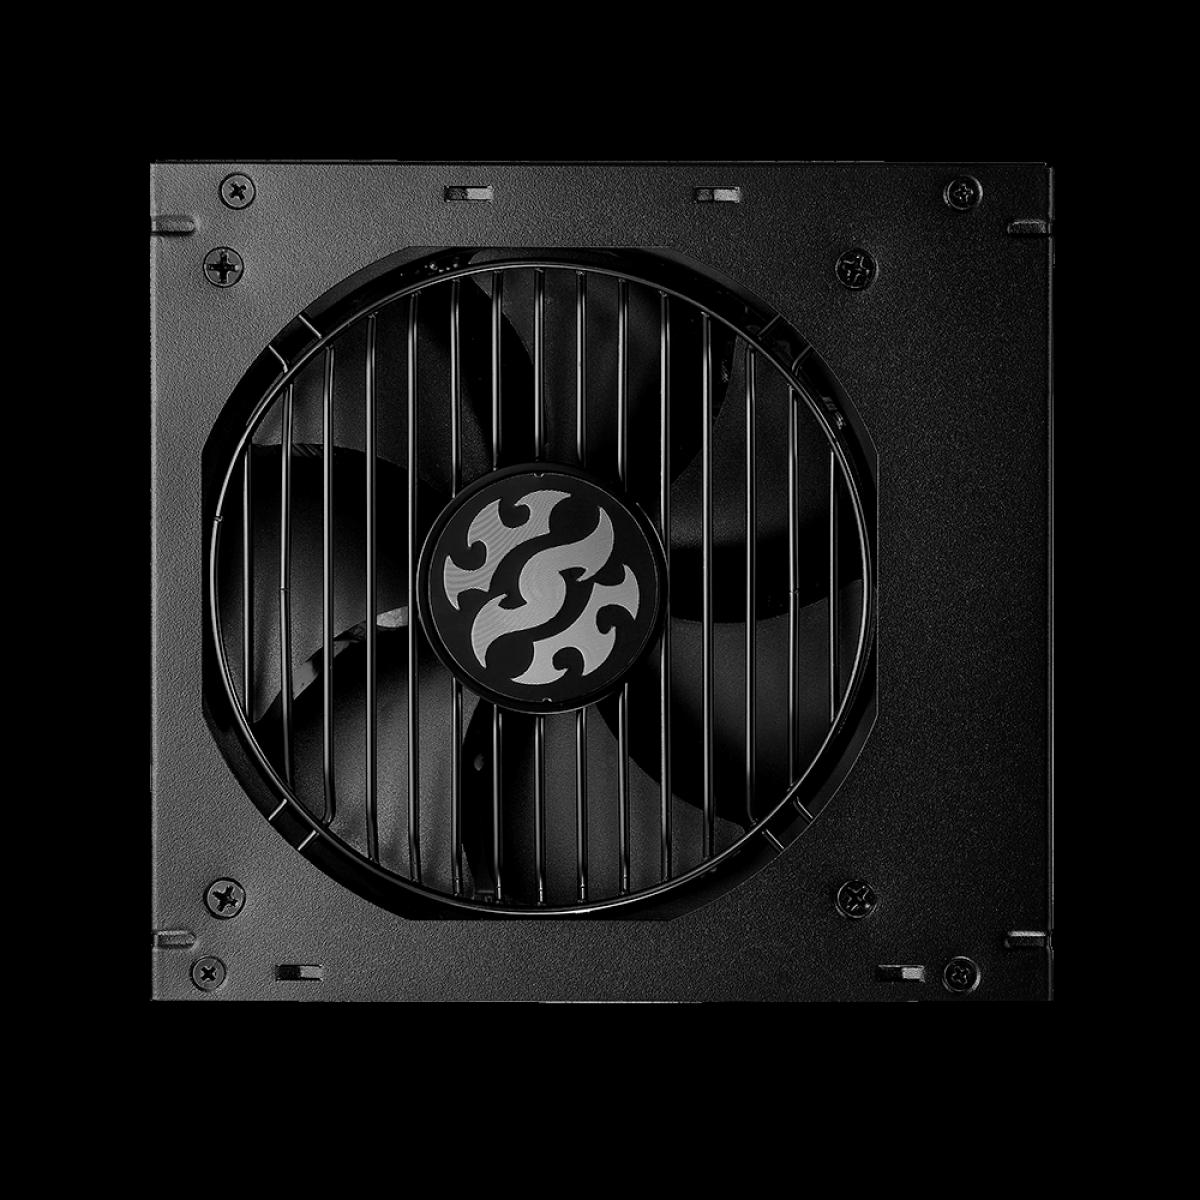 Fonte XPG, Core Reactor, 750W, 80 Plus Gold, Modular, PFC Ativo, 75260166